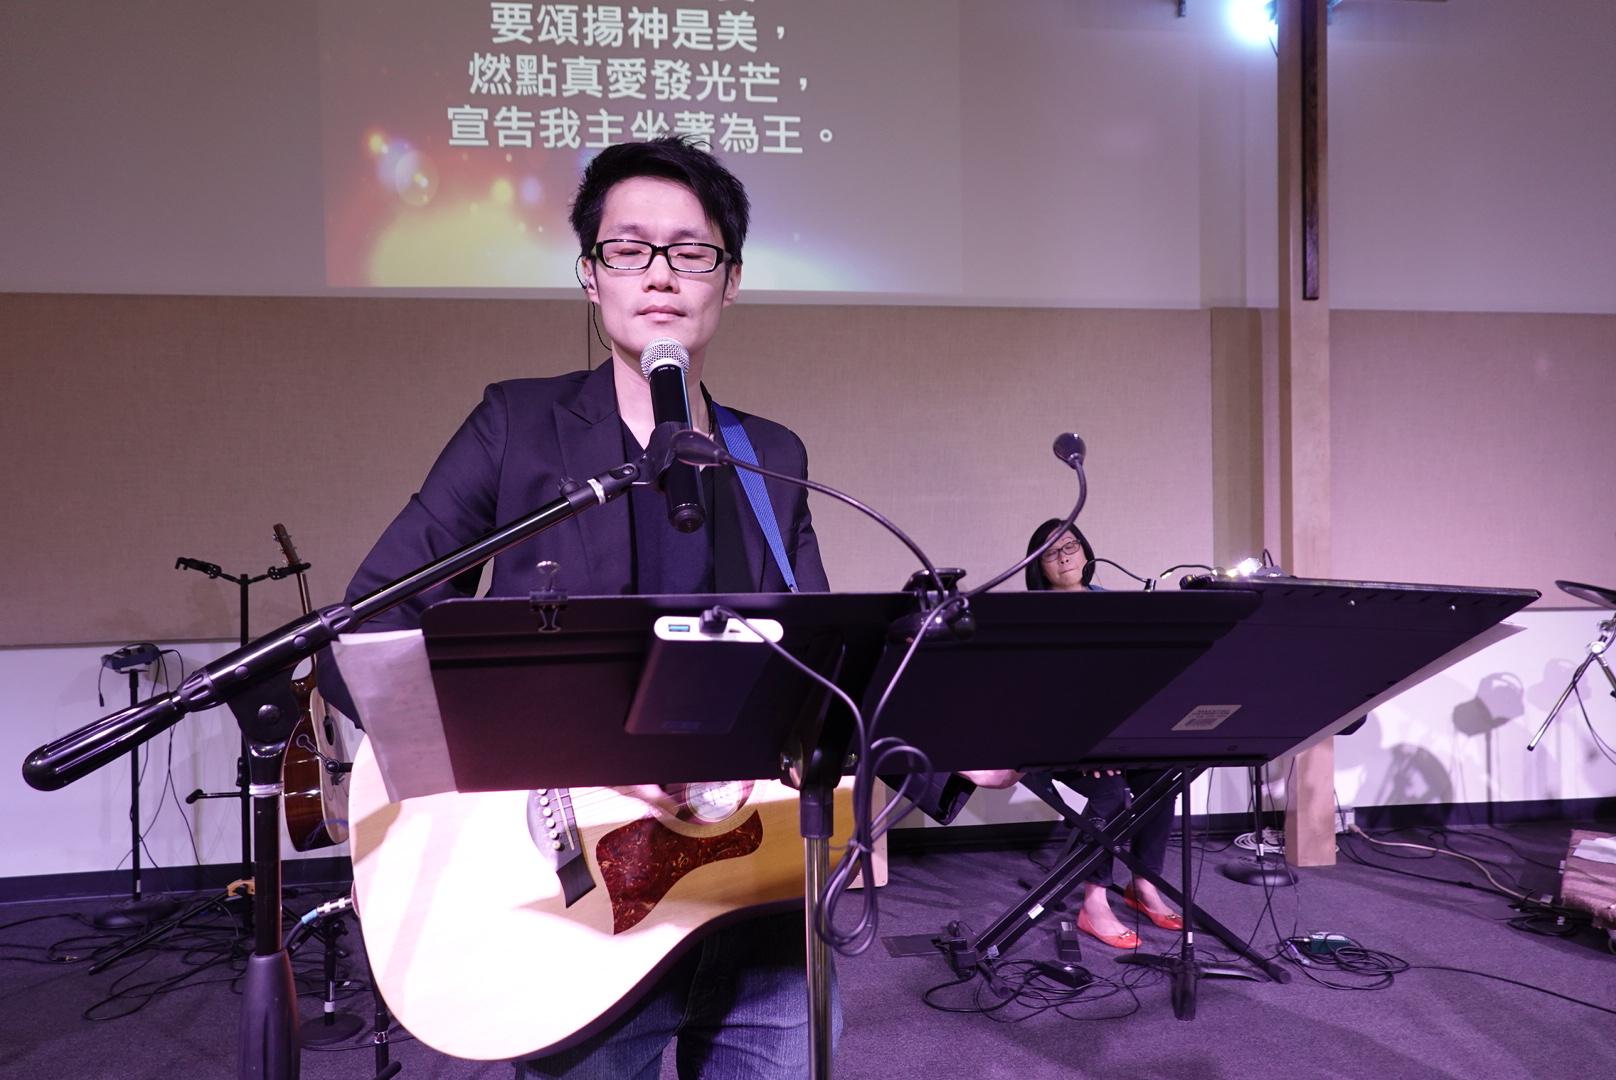 Author: David Cheung